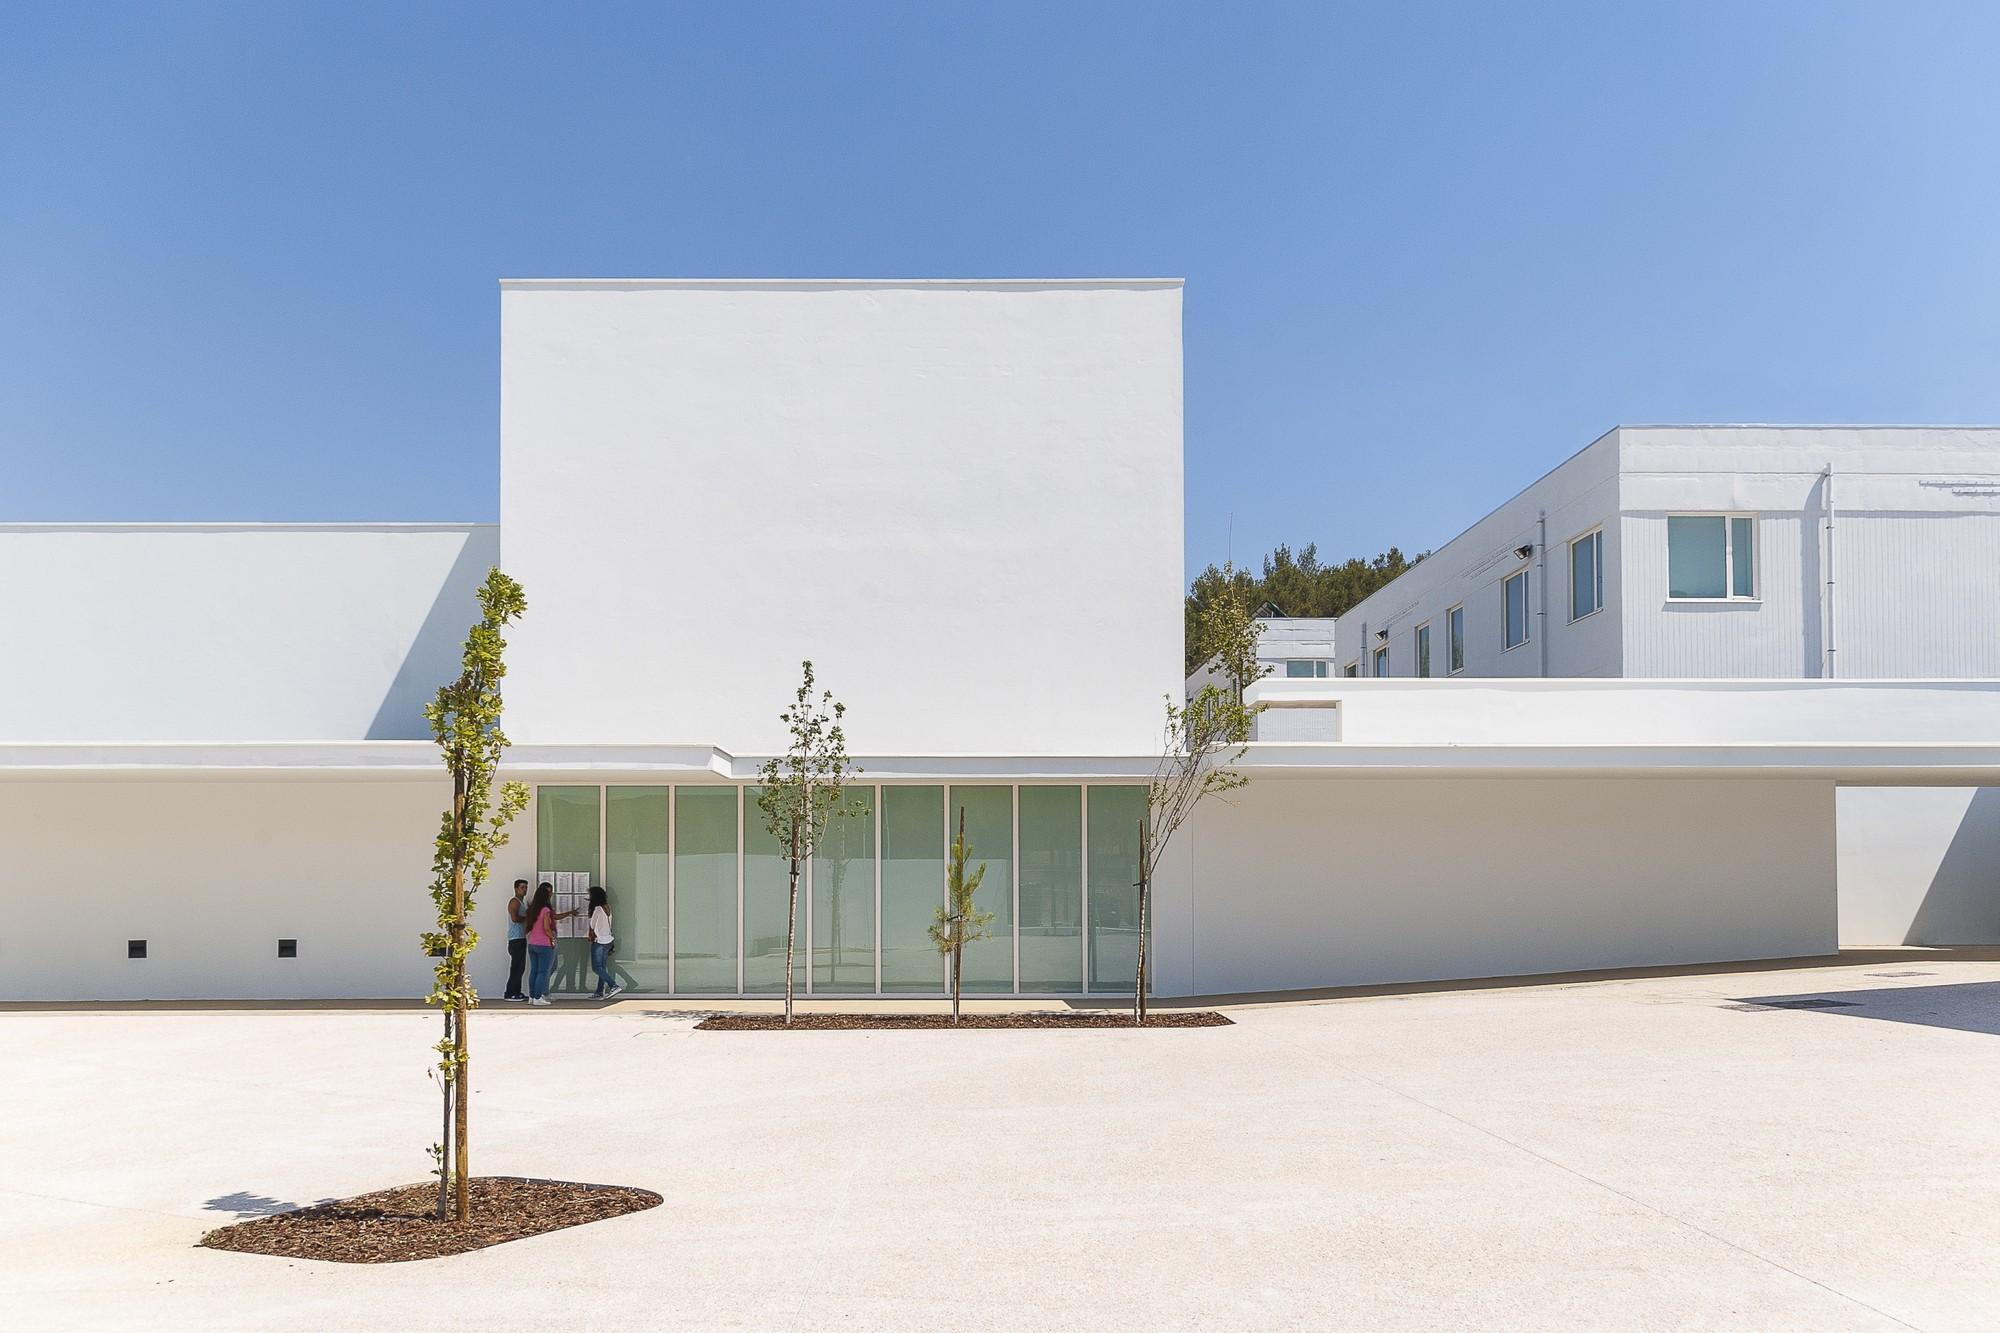 Modernización de la Escuela Lima de Freitas / Ricardo Carvalho + Joana Vilhena Arquitectos, © Nuno Gaspar / RCJV Arquitectos